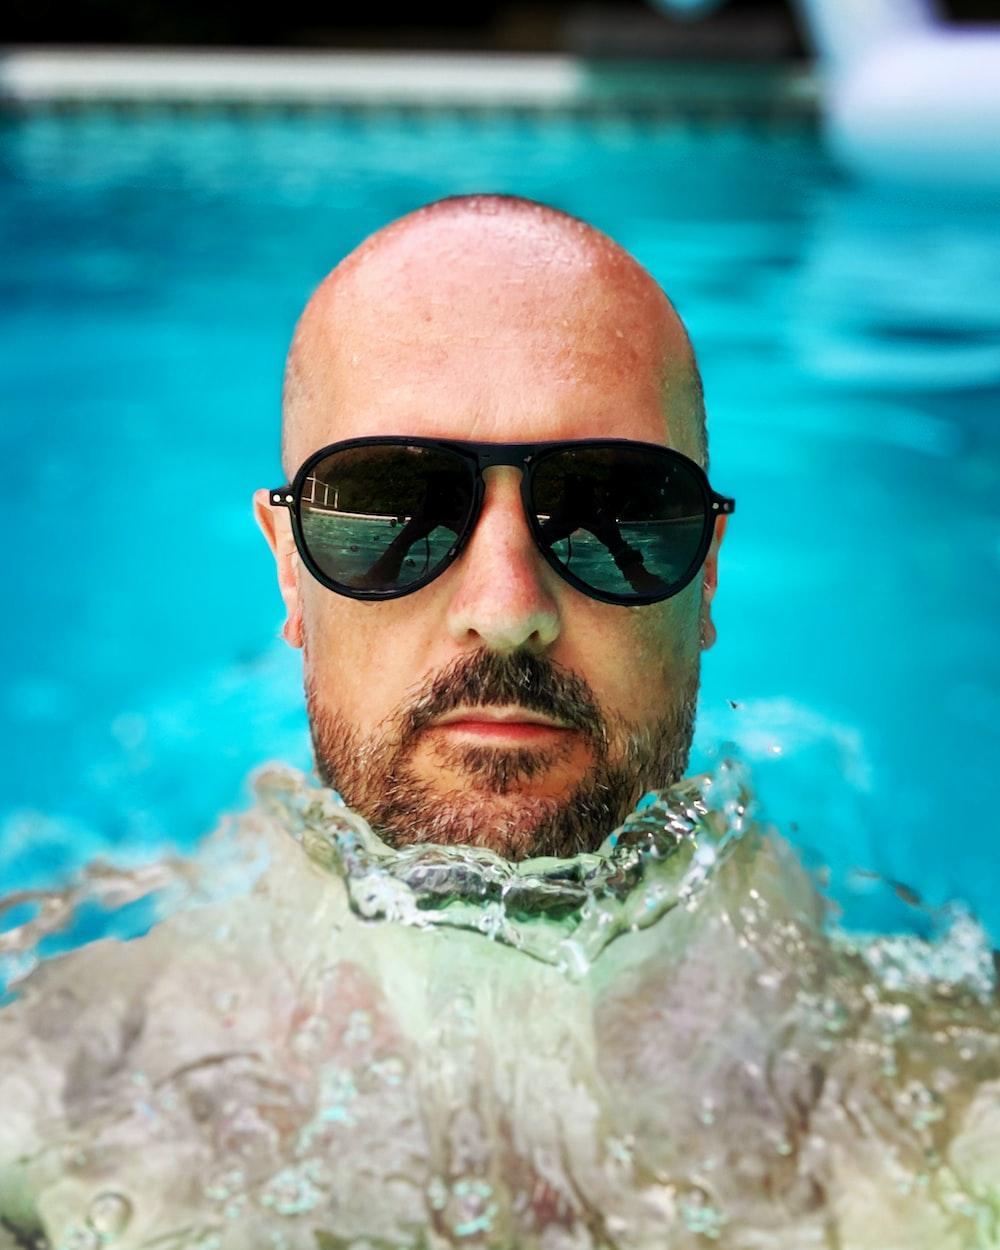 man in black sunglasses in swimming pool